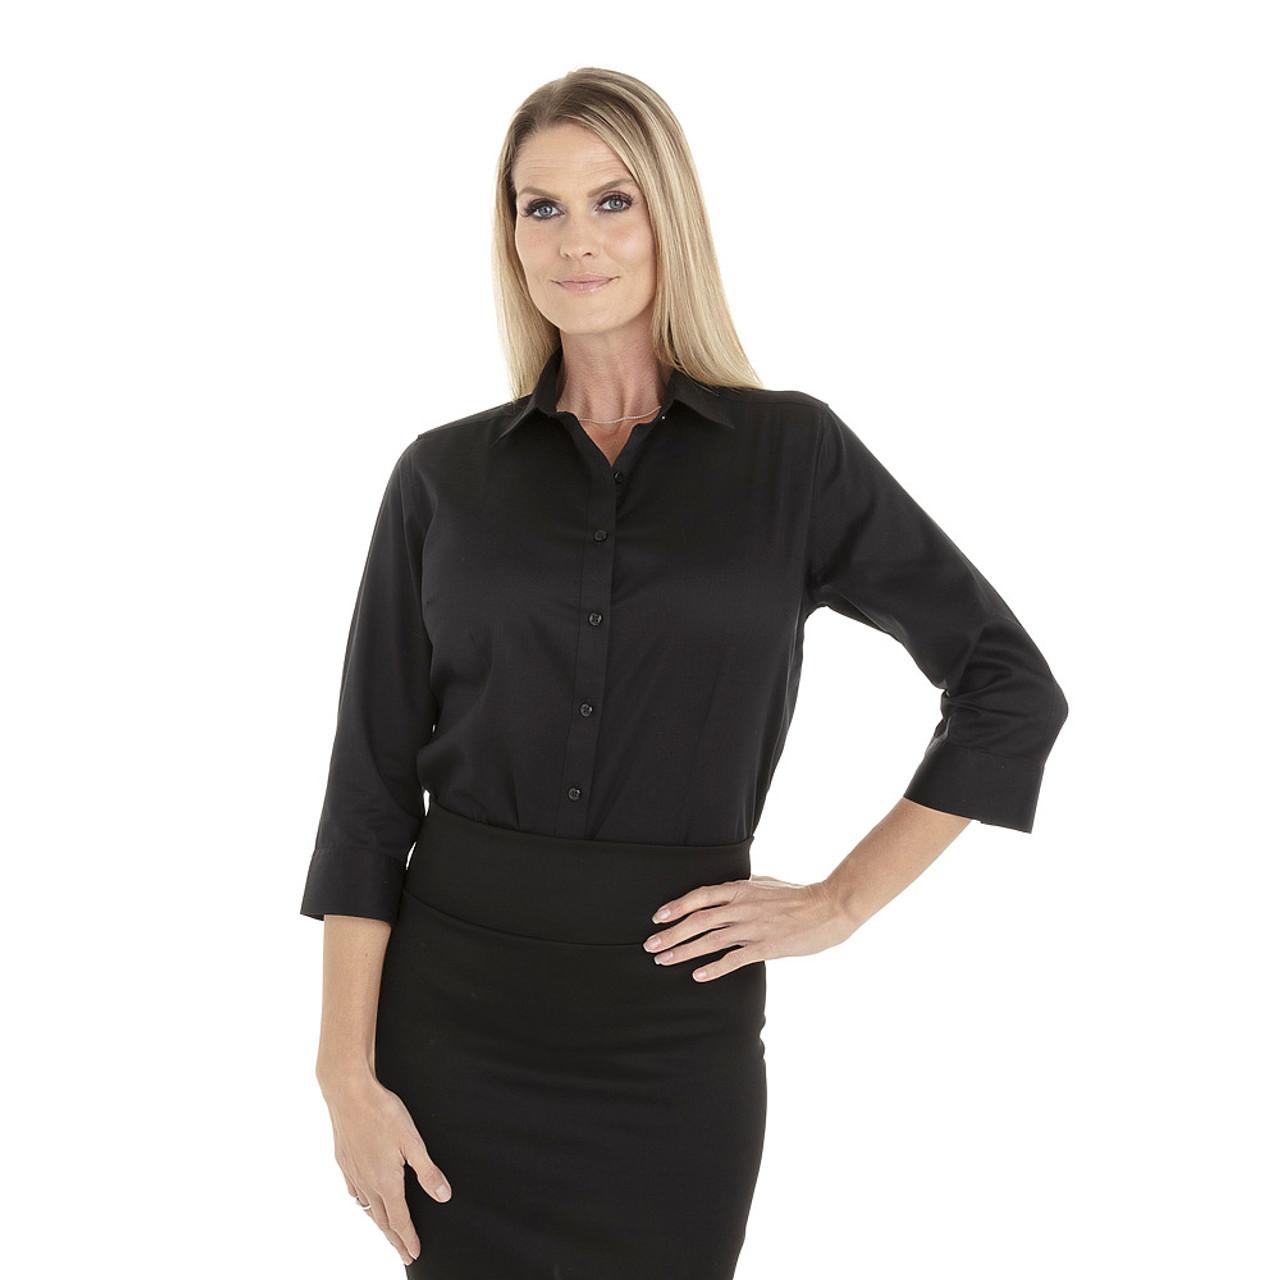 Black - 18CV304 Van Heusen Ladies' ¾ Sleeve Dress Twill Shirt | T-shirt.ca